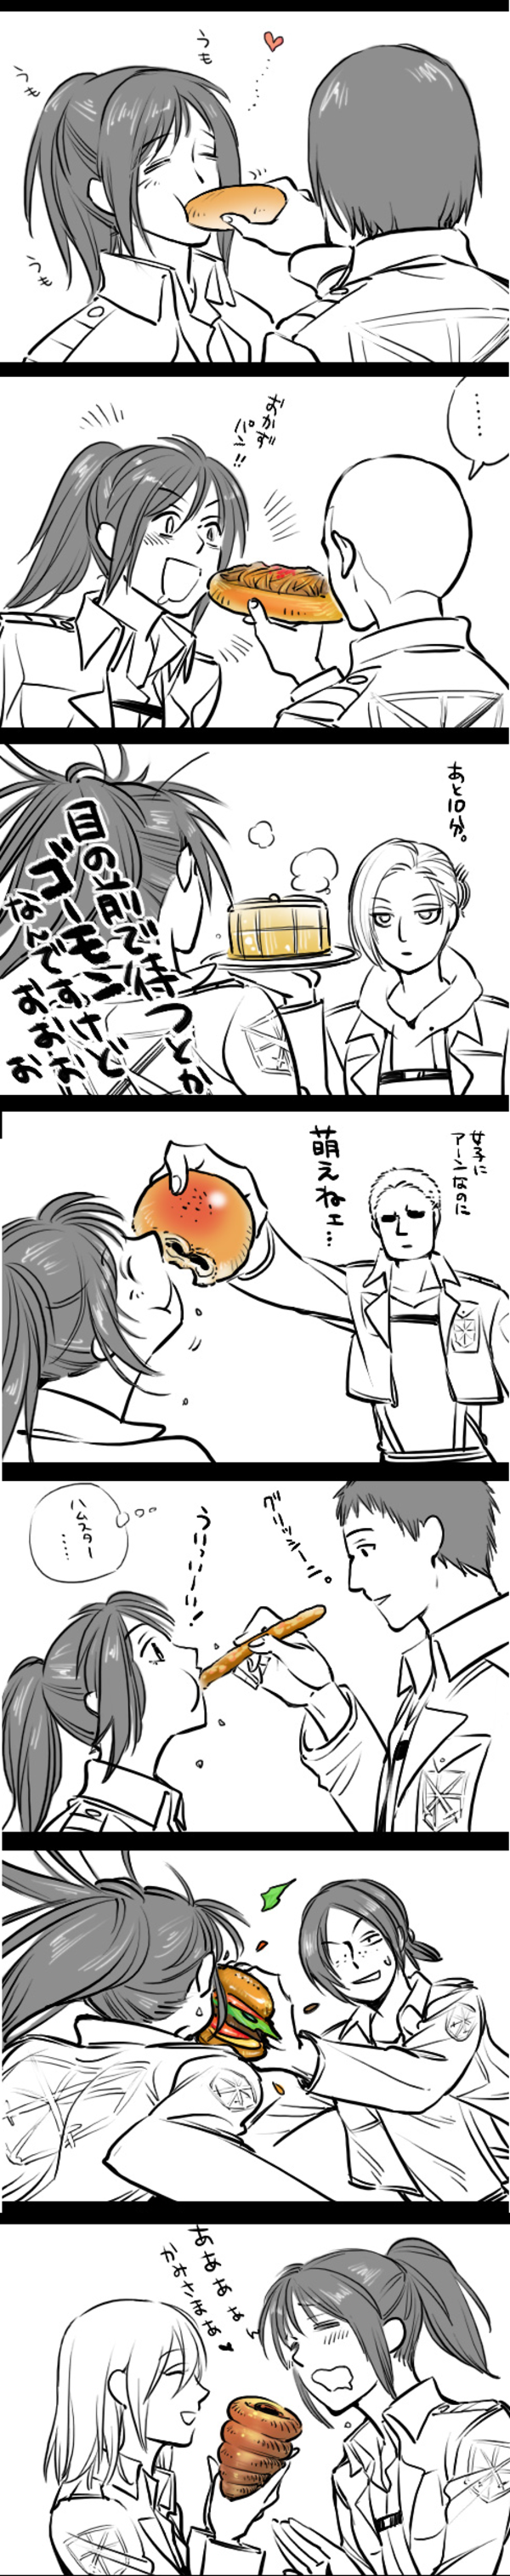 Sasha Food Porn! | Attack on Titan / Shingeki No Kyojin | Know Your Meme